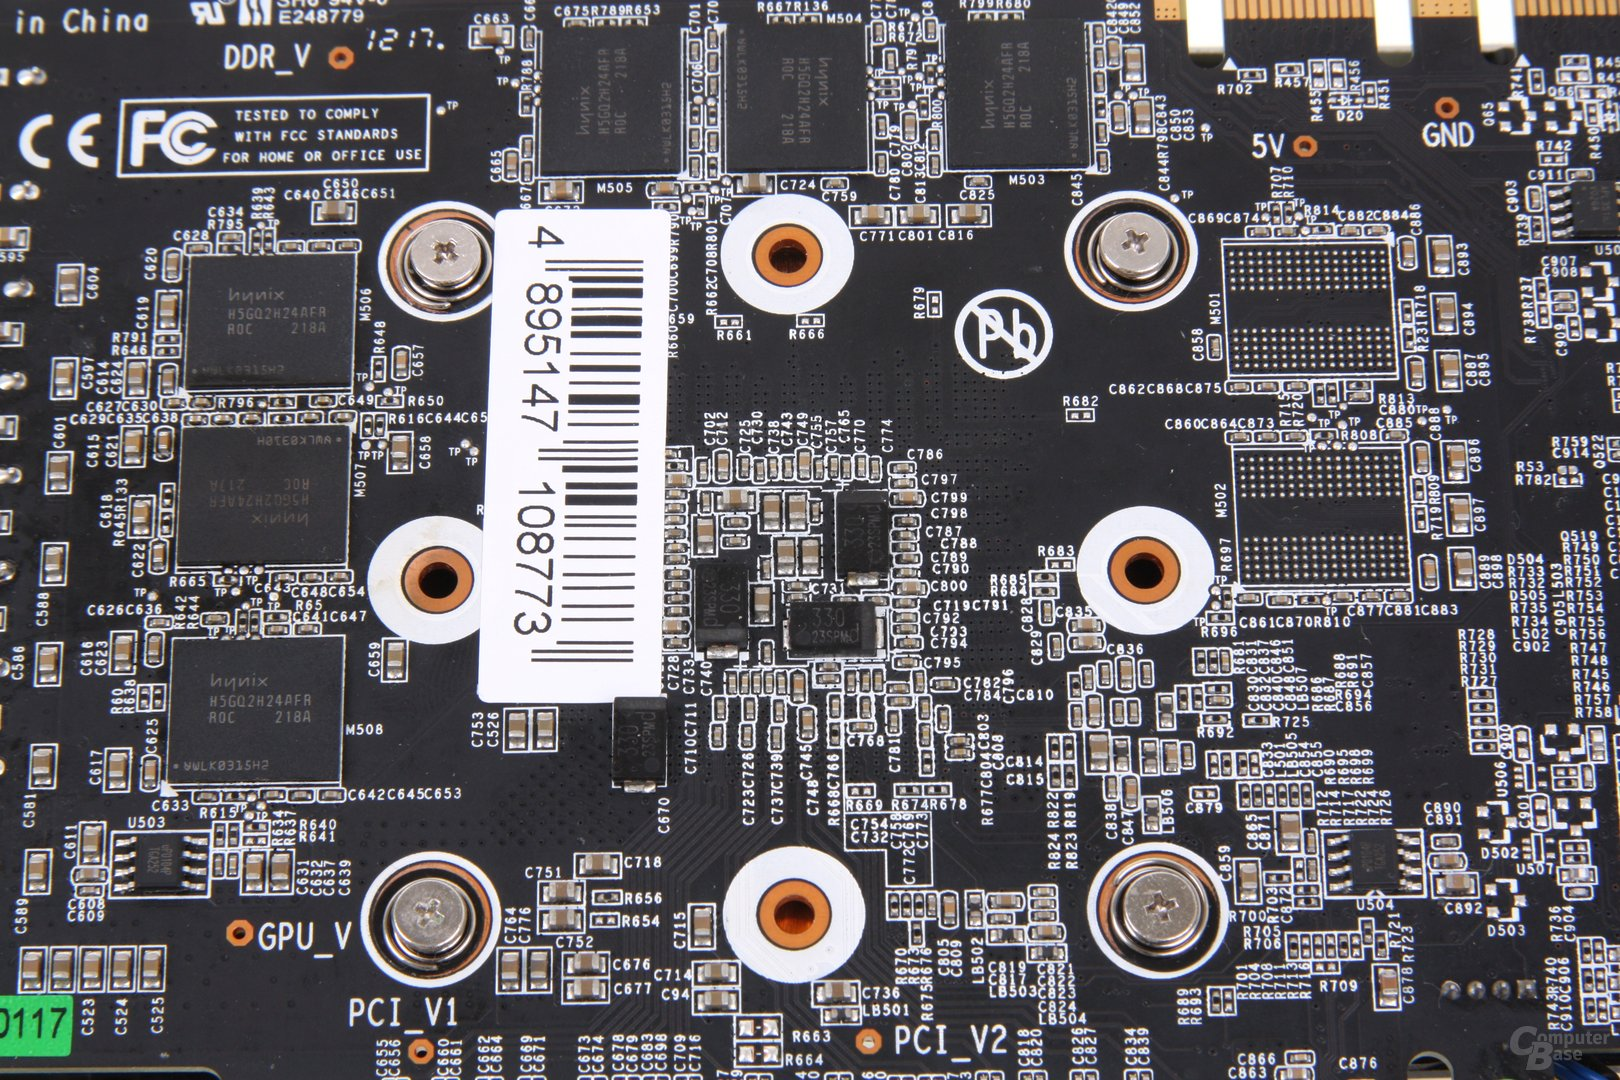 GeForce GTX 660 Ti OC EX GPU-Rückseite